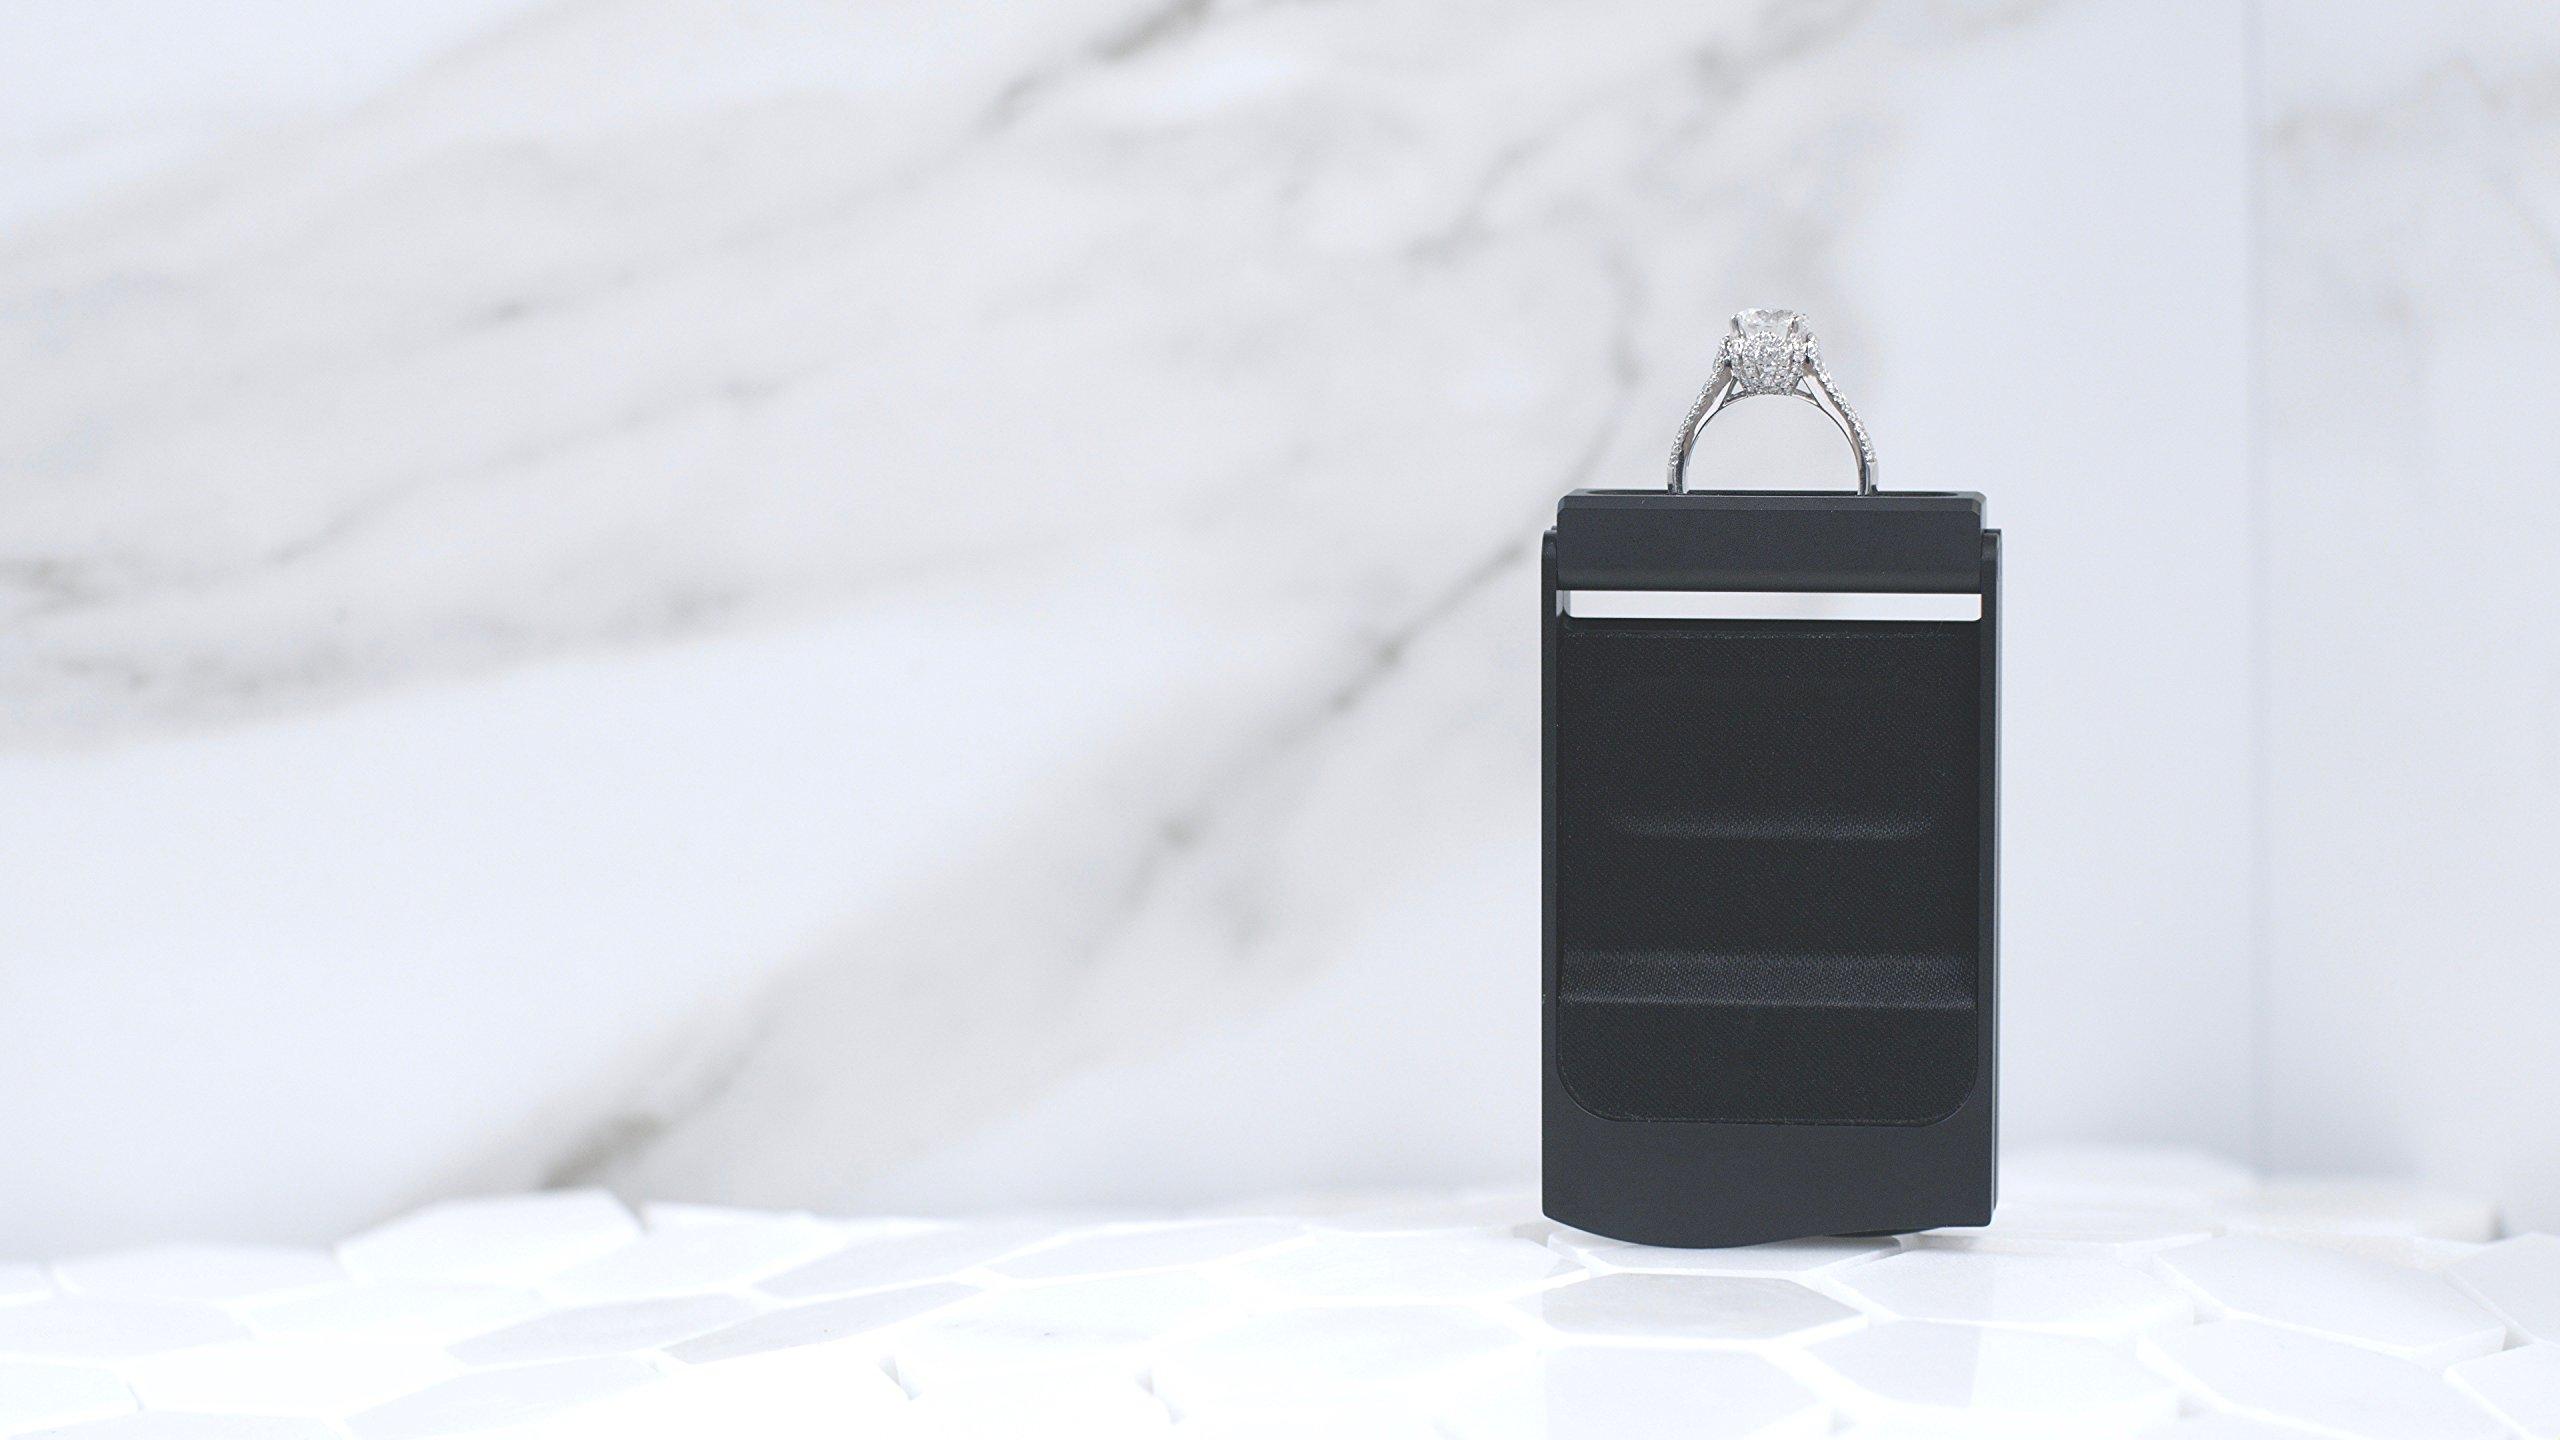 The Monarch Engagement Ring Box - Premium Wedding Ring Box by Monarch